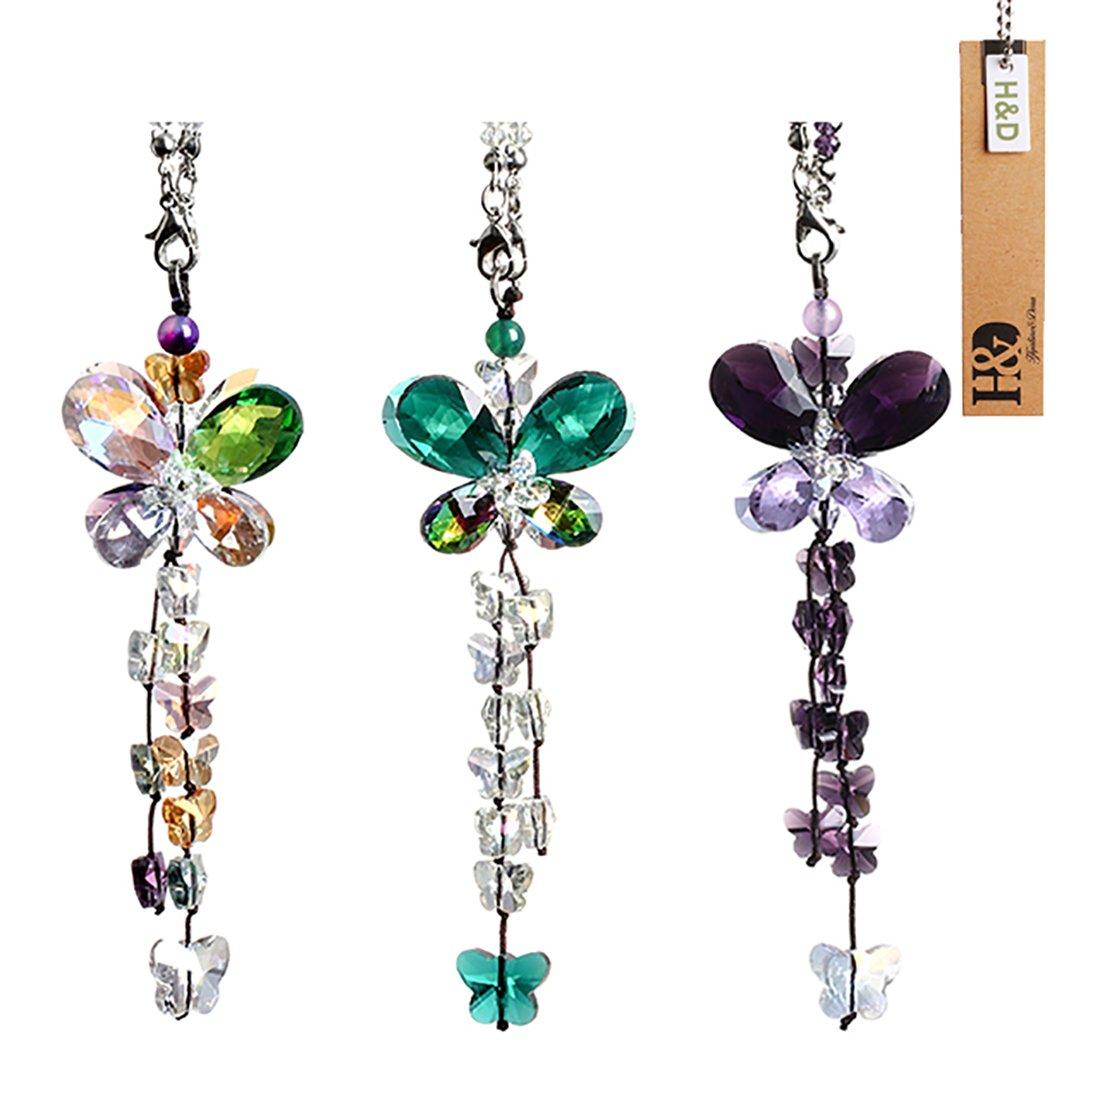 H&D, acchiappasole pendente Fengshui, con farfalle, in cristallo, effetto arcobaleno, lampadario con prisma Green